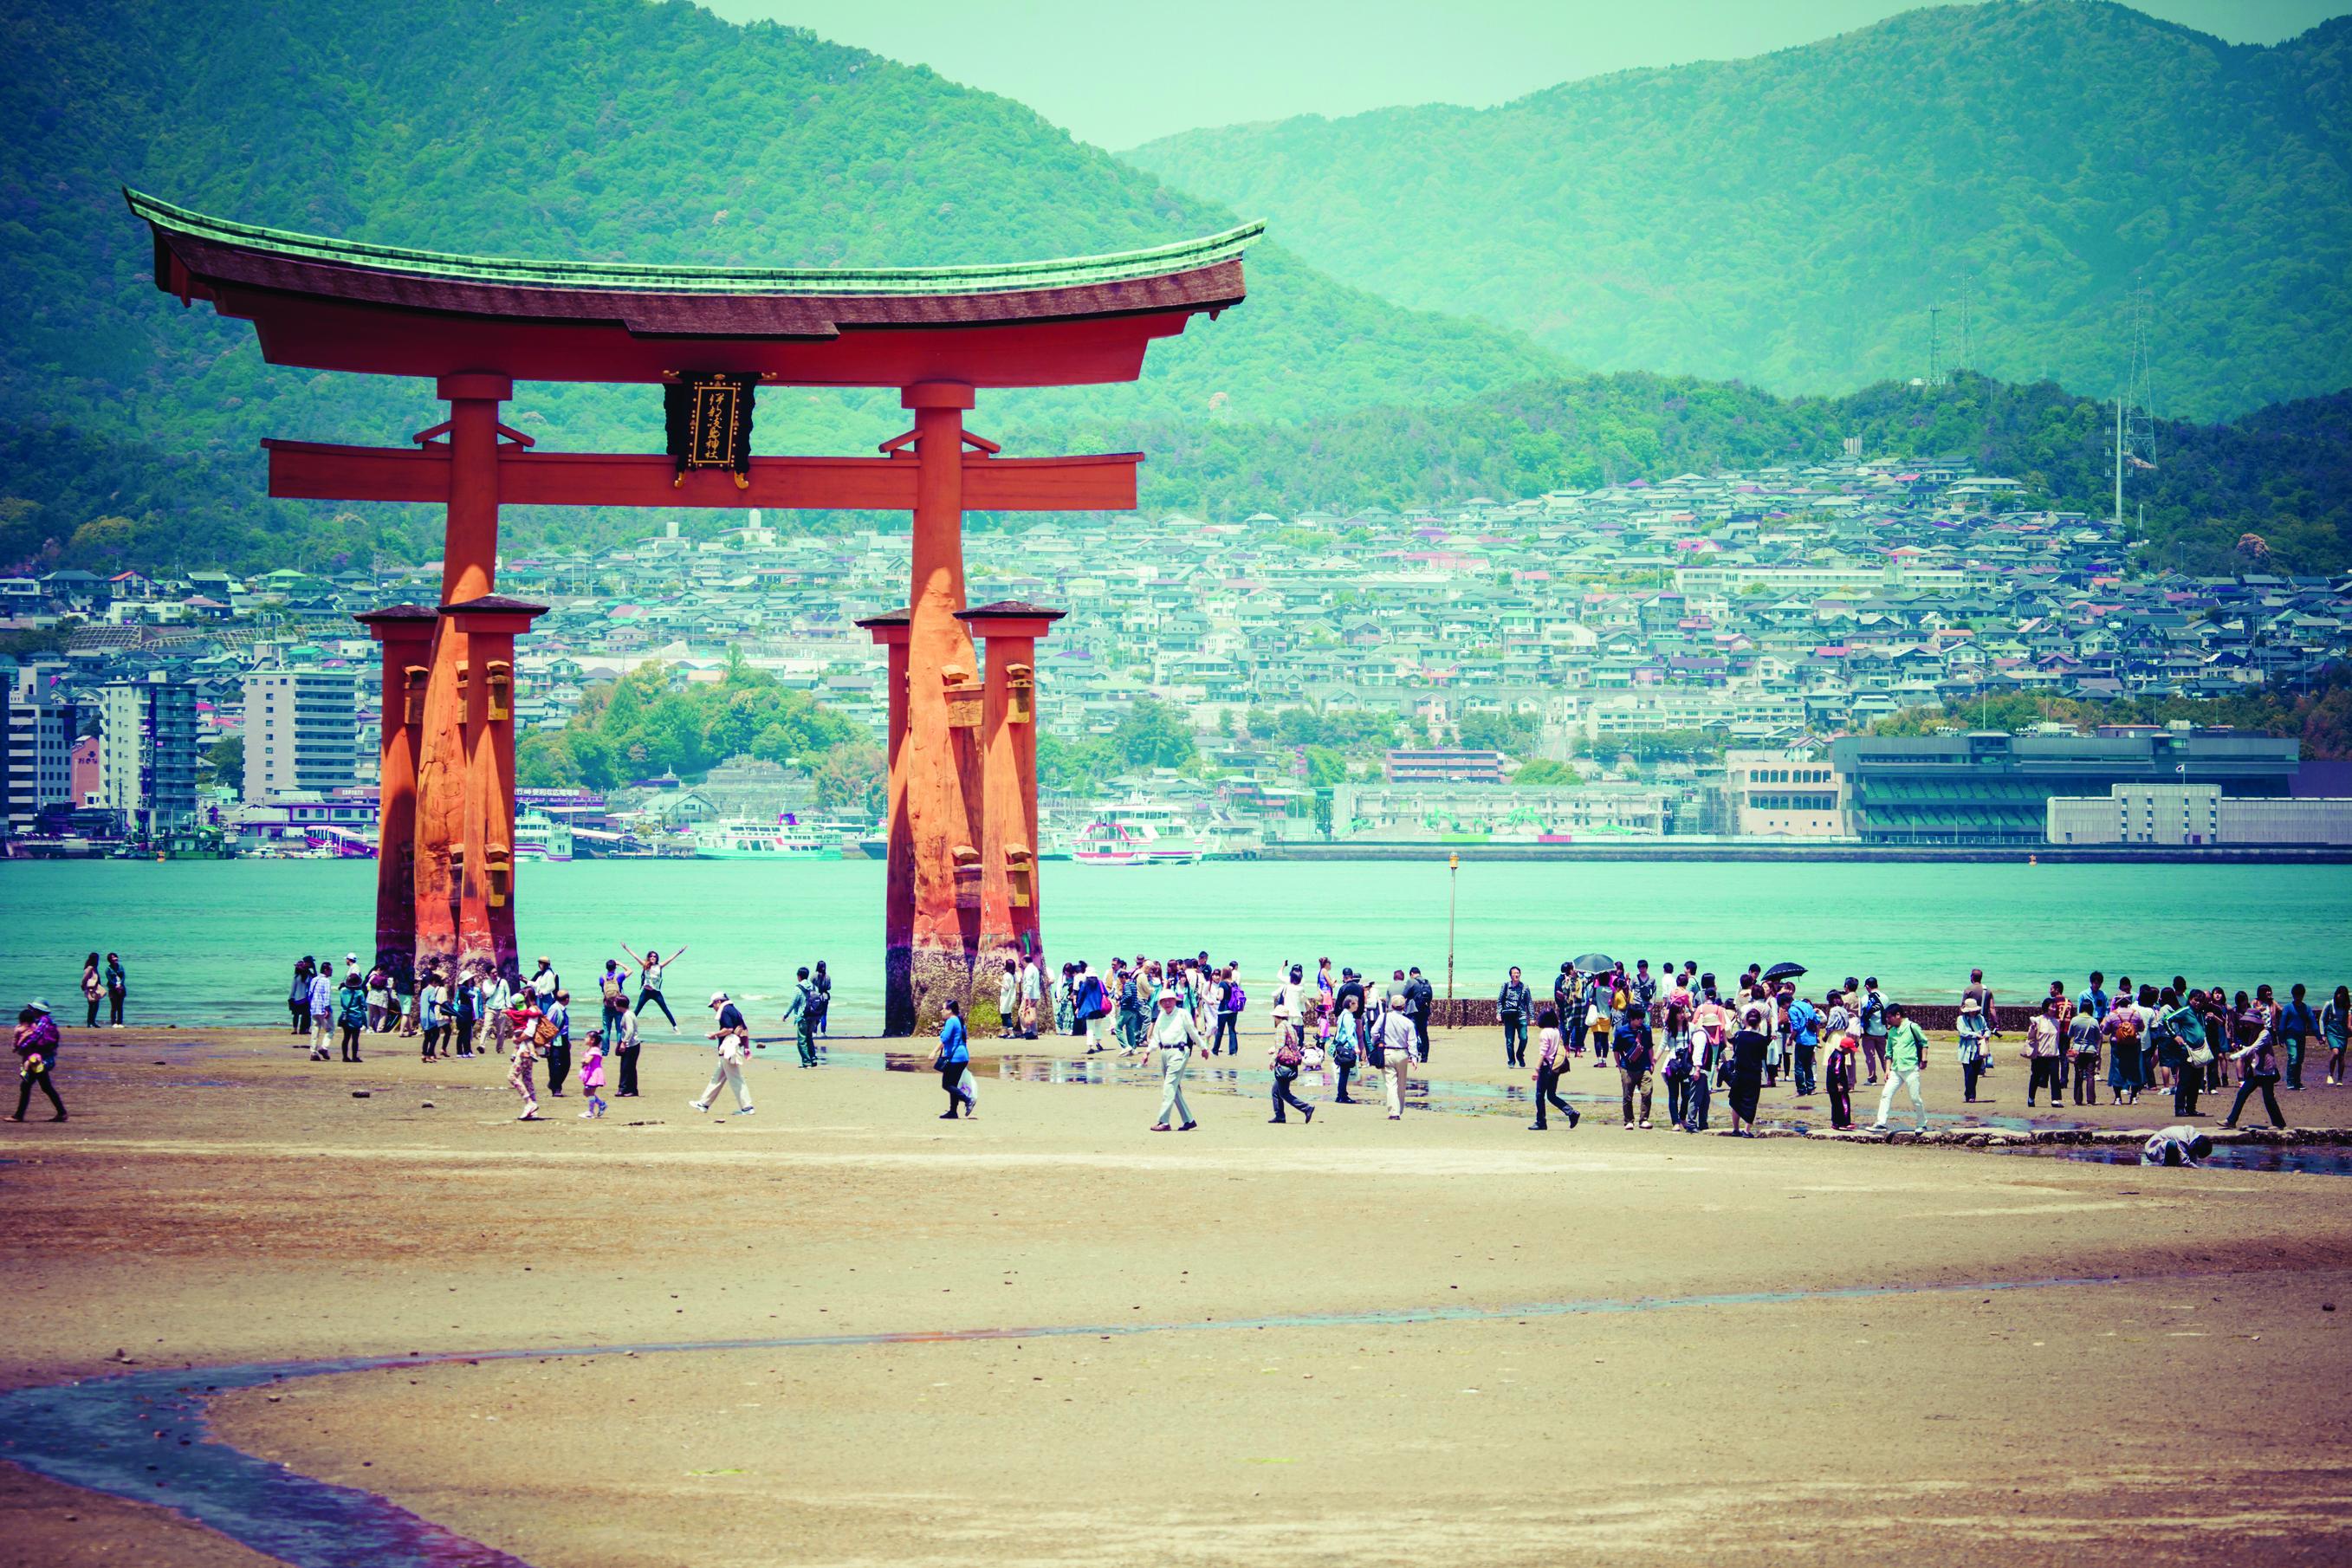 School - CIEE High School Semester/Year Abroad Program in Japan  1